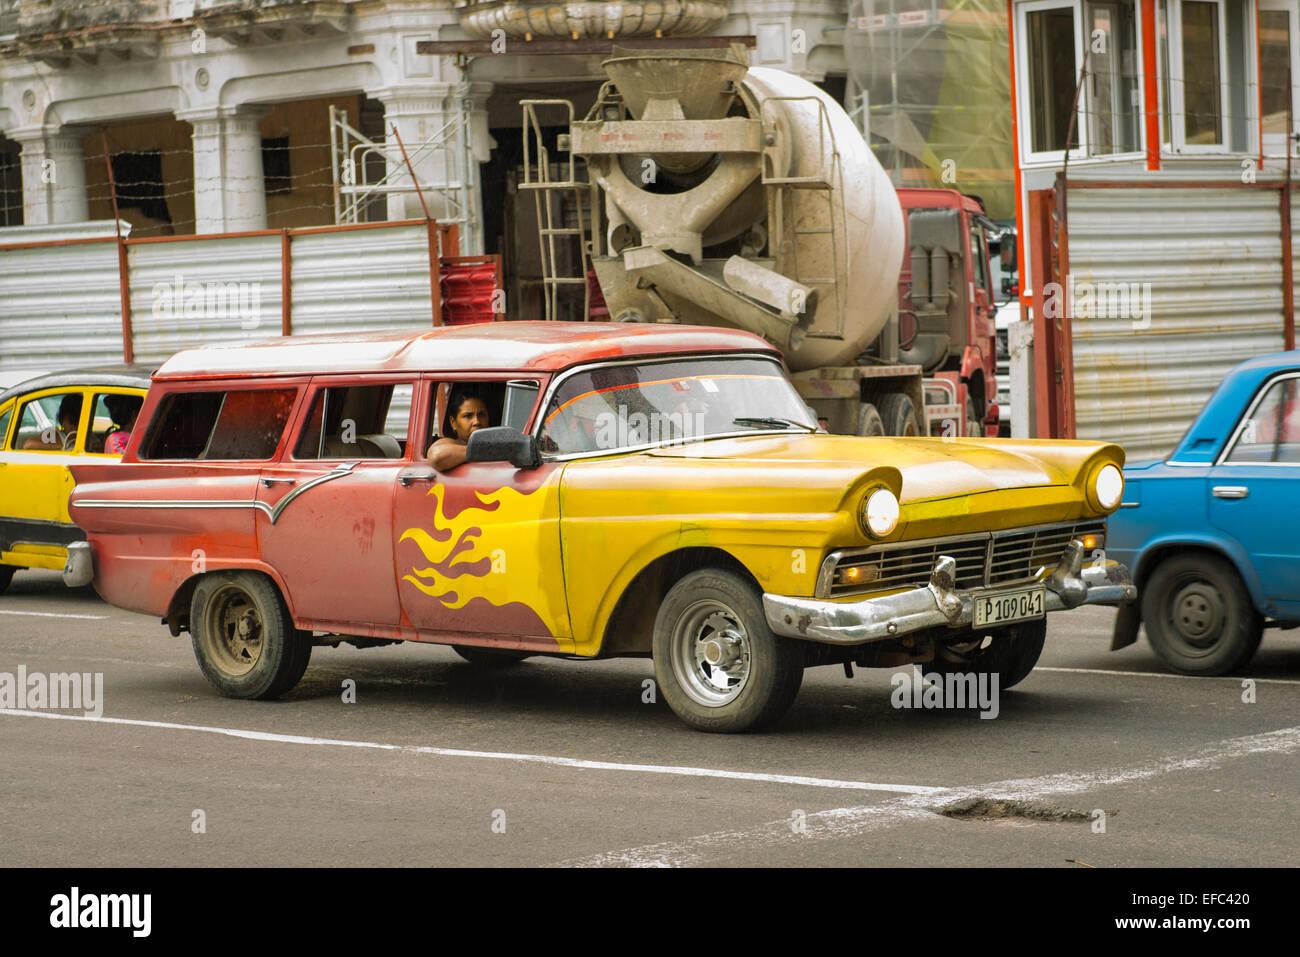 The 1950s Car Scene Stock Photos & The 1950s Car Scene Stock Images ...